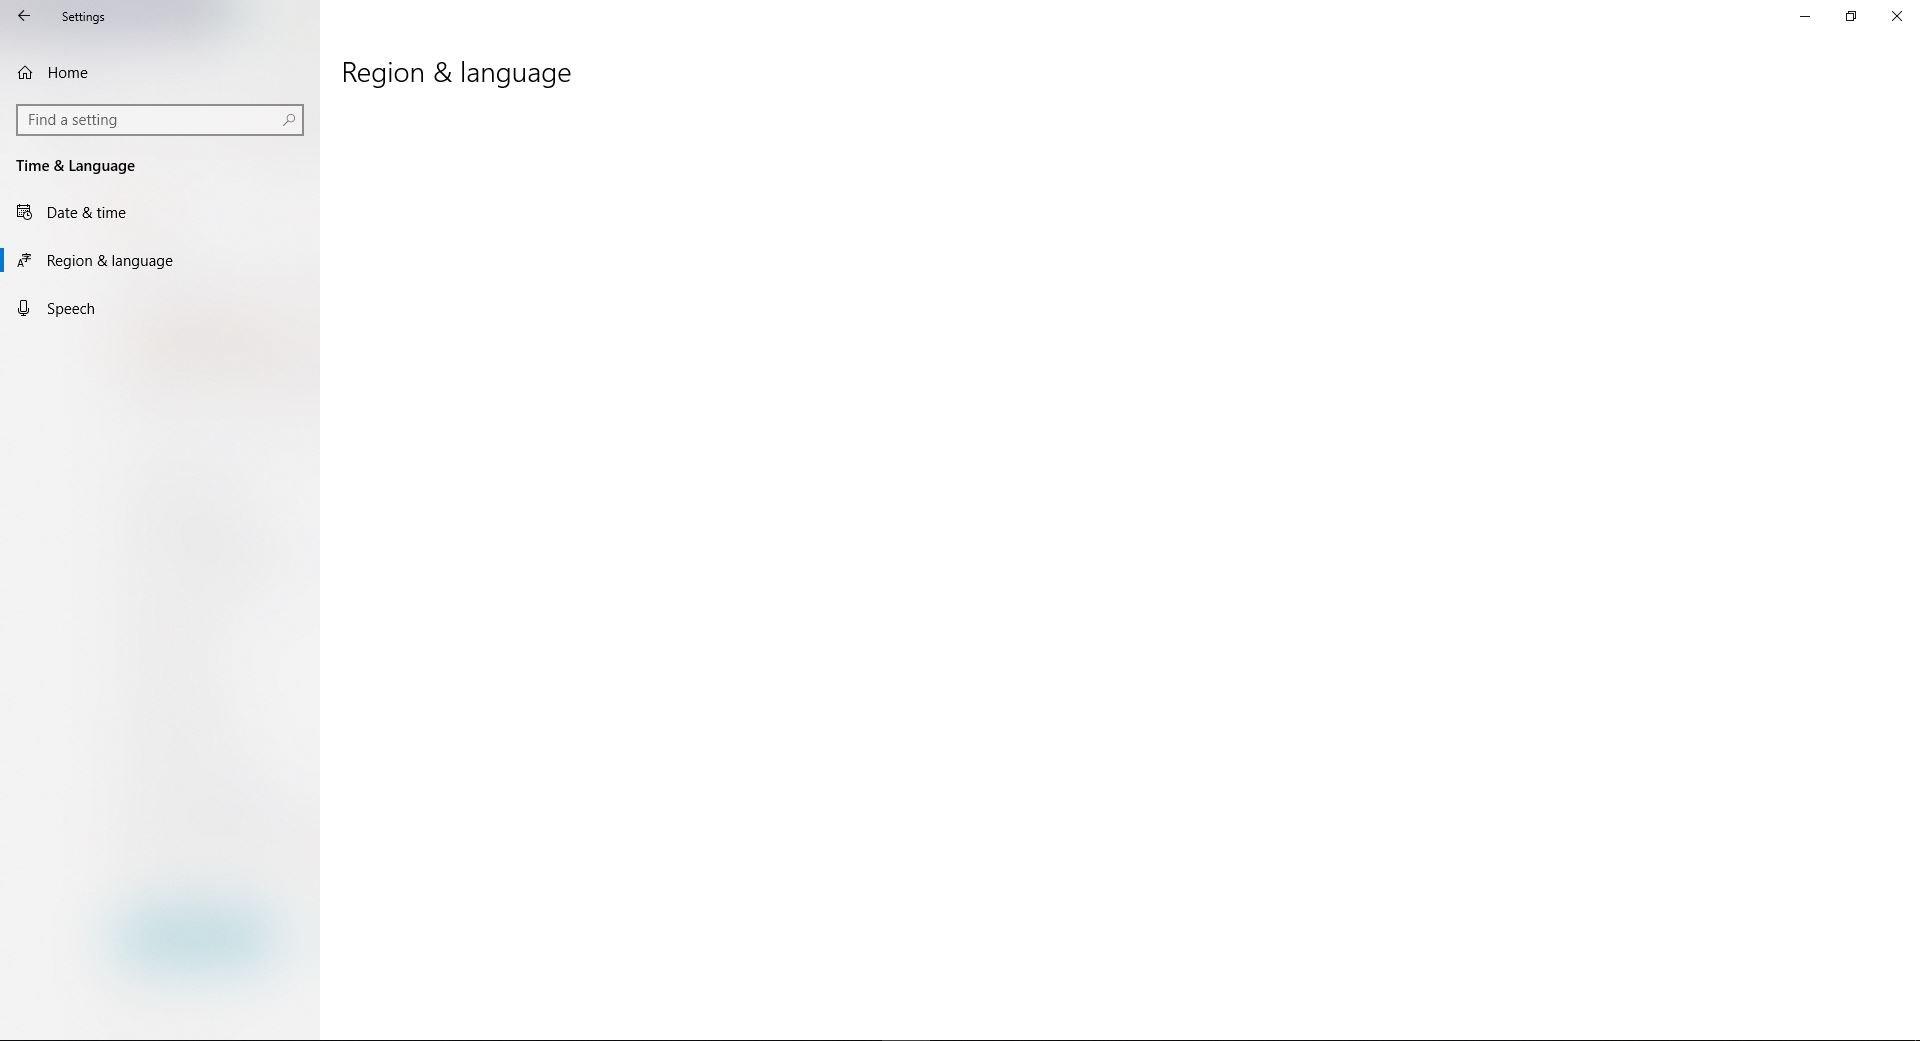 Region and language screen blank 6e09dace-97bc-47f4-932c-f6b913d04cf0?upload=true.jpg